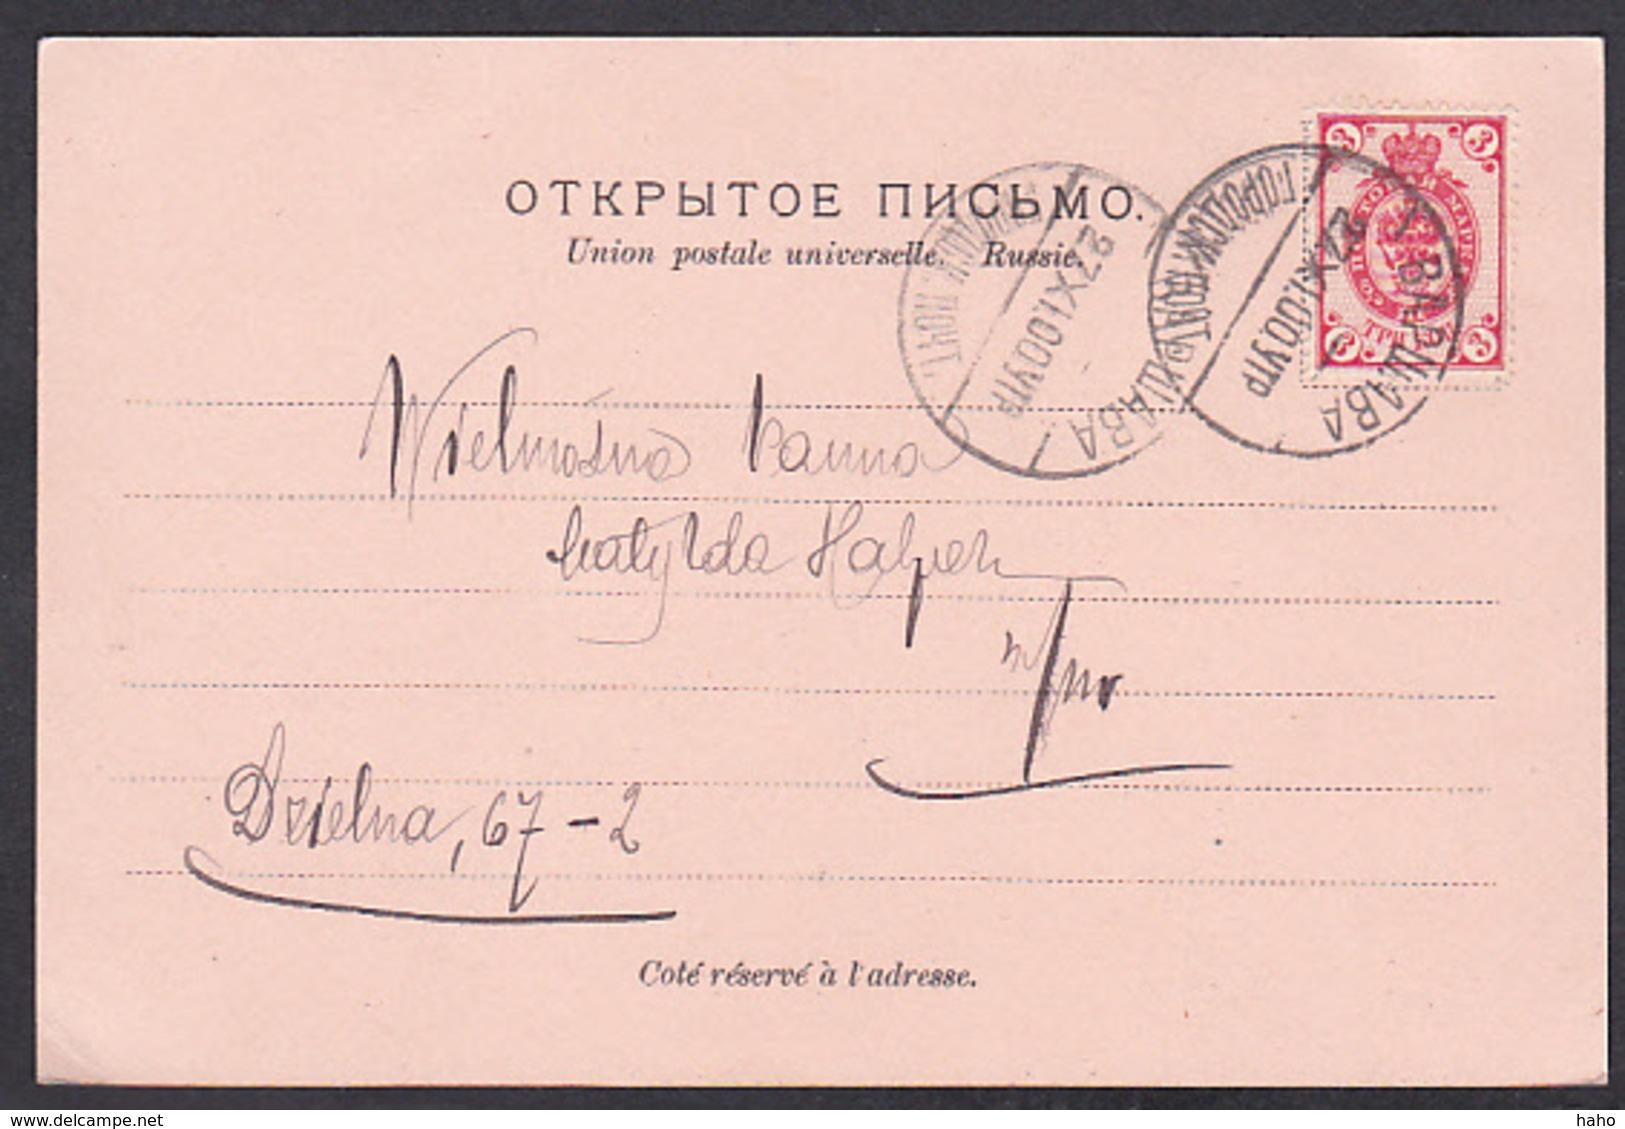 Poland. Postcard Exhibition In Warsaw 1900 - Poland